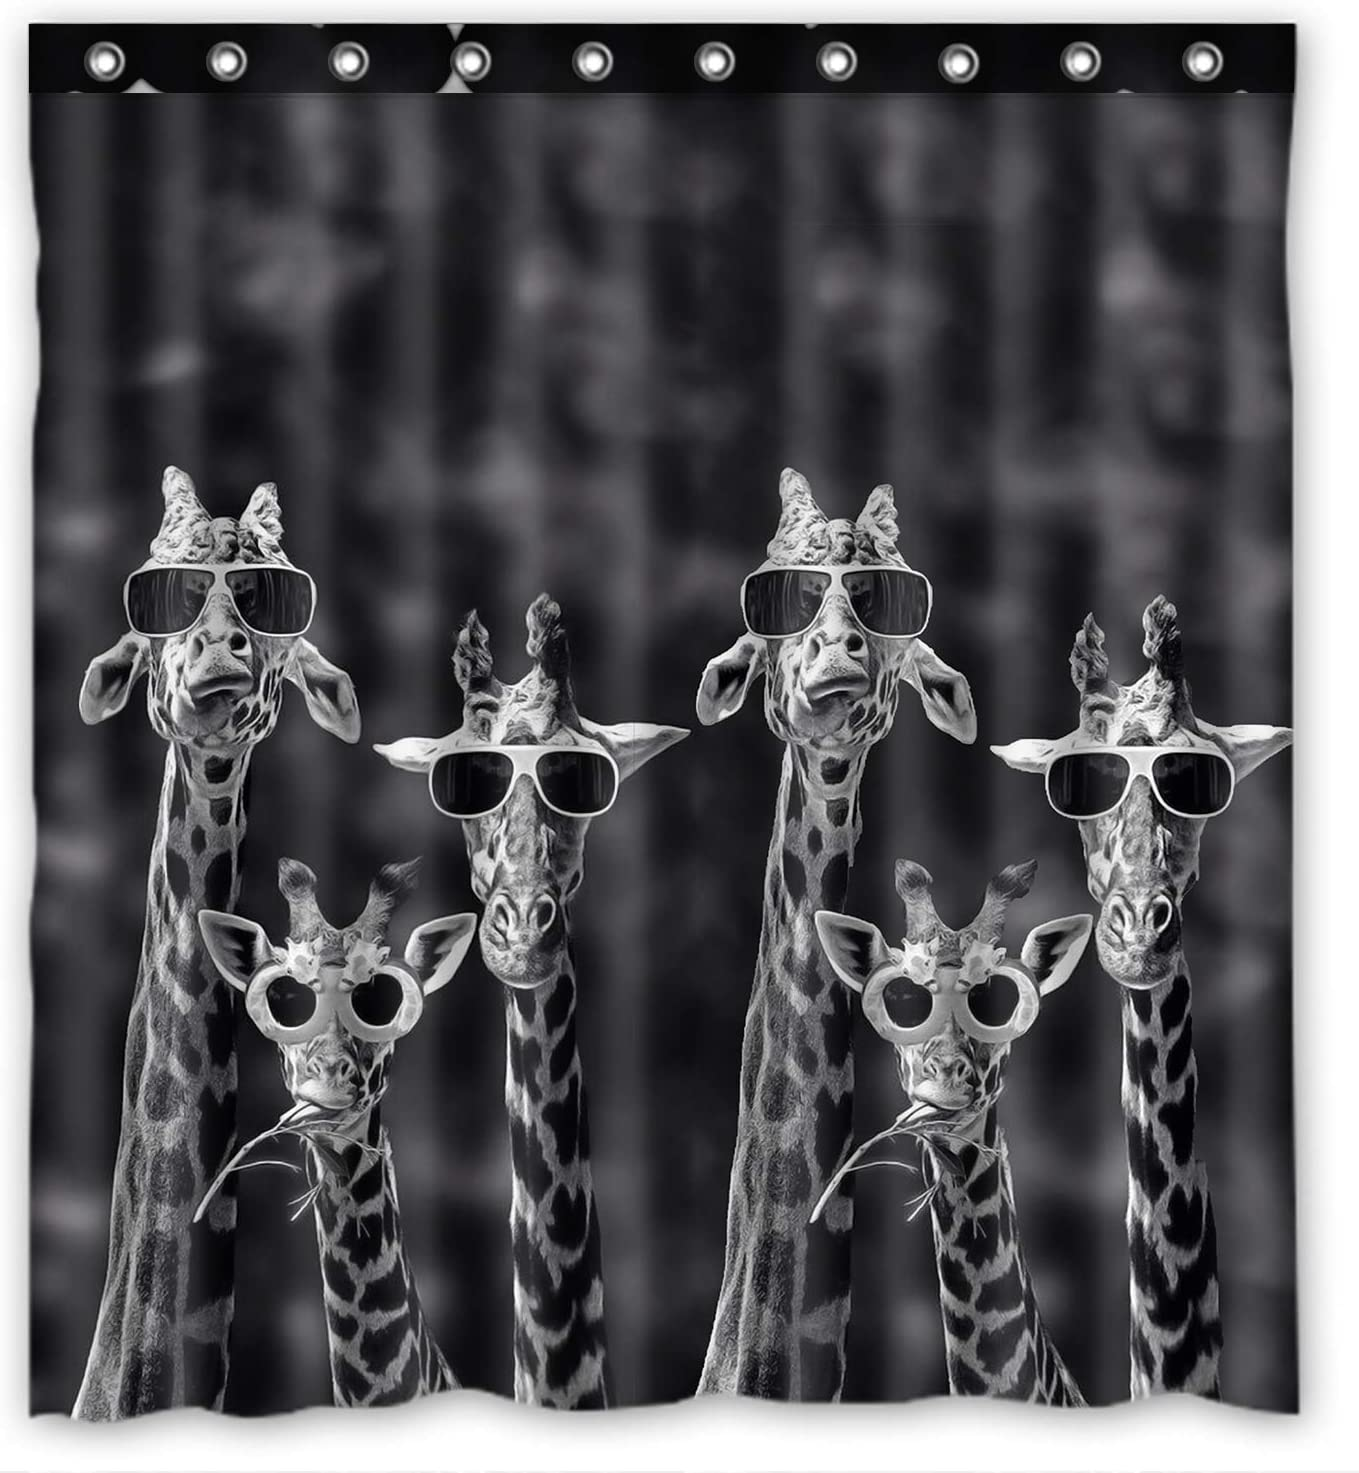 KXMDXA Cute Giraffe Wearing Glasses Funny Pattern Animal Waterproof Polyester Bath Shower Curtain Size 66x72 Inch